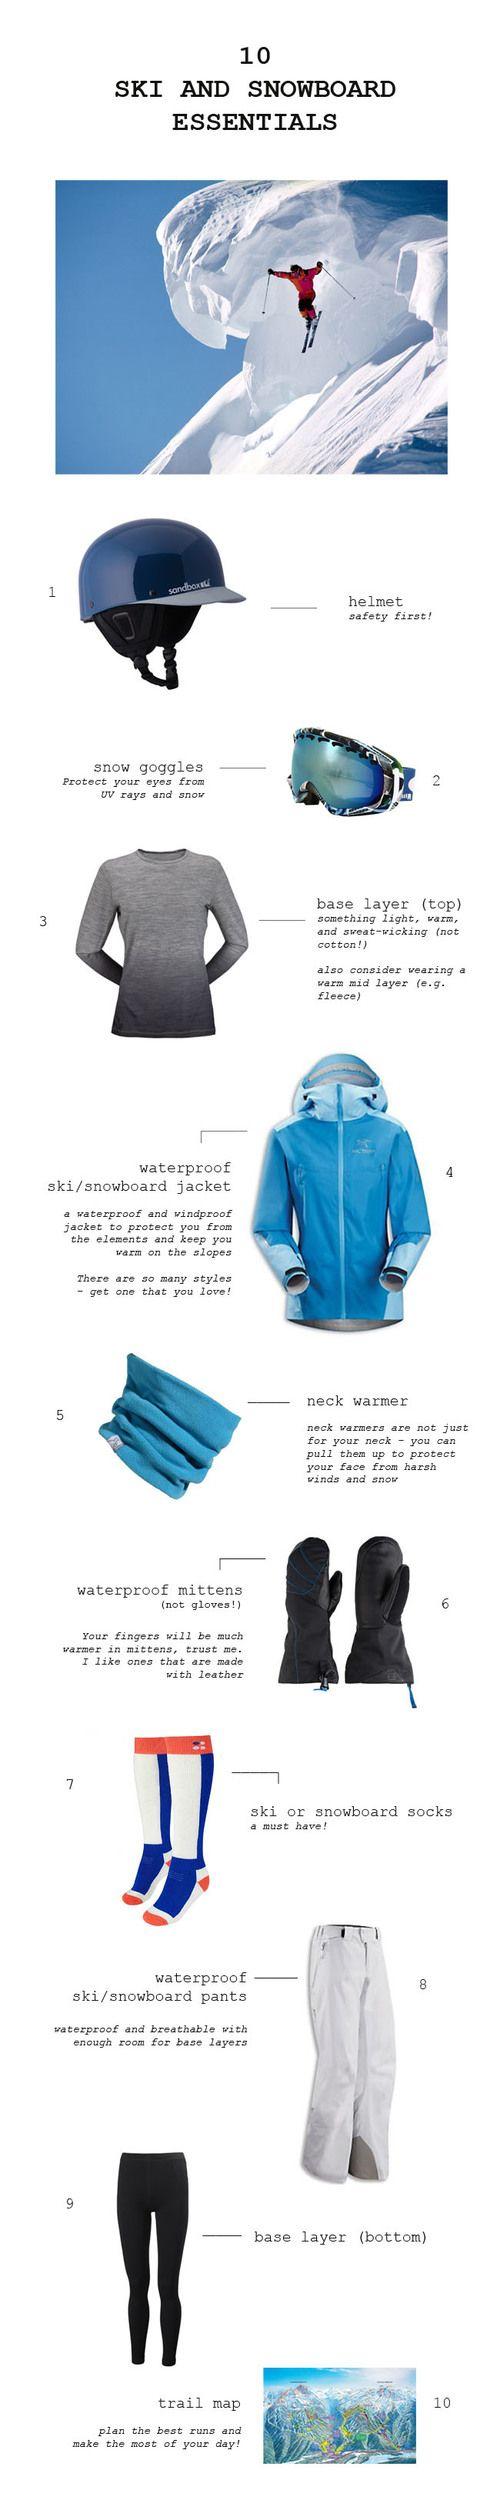 10 ski and snowboard essentials